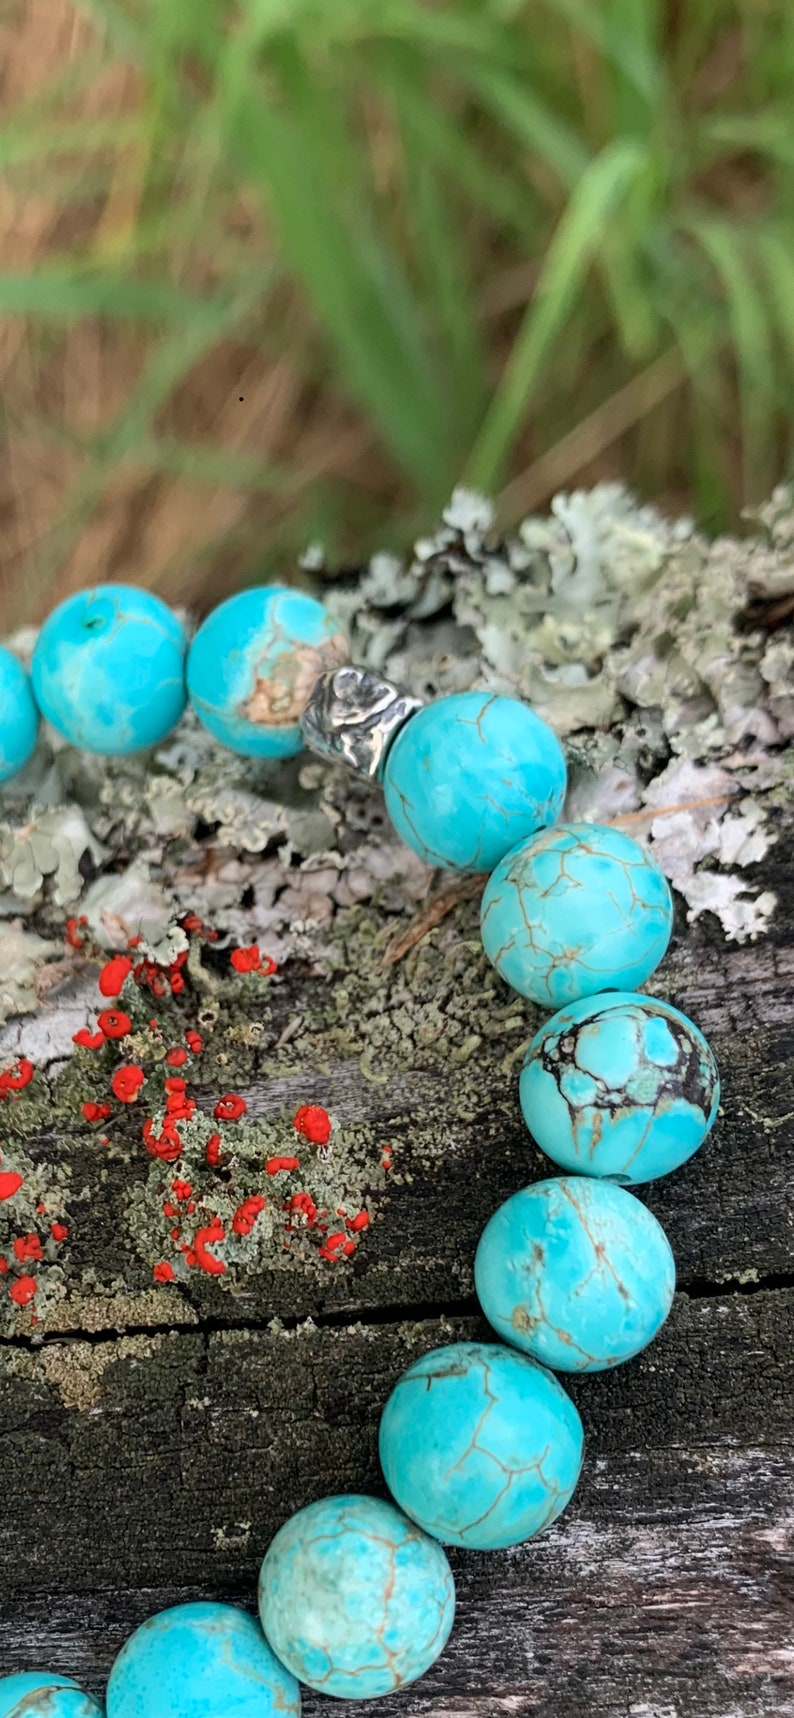 Genuine Turquoise Handmade Gemstone Jewelry Women/'s or Men/'s Bracelet Real Stones Sterling Silver Heart Detail